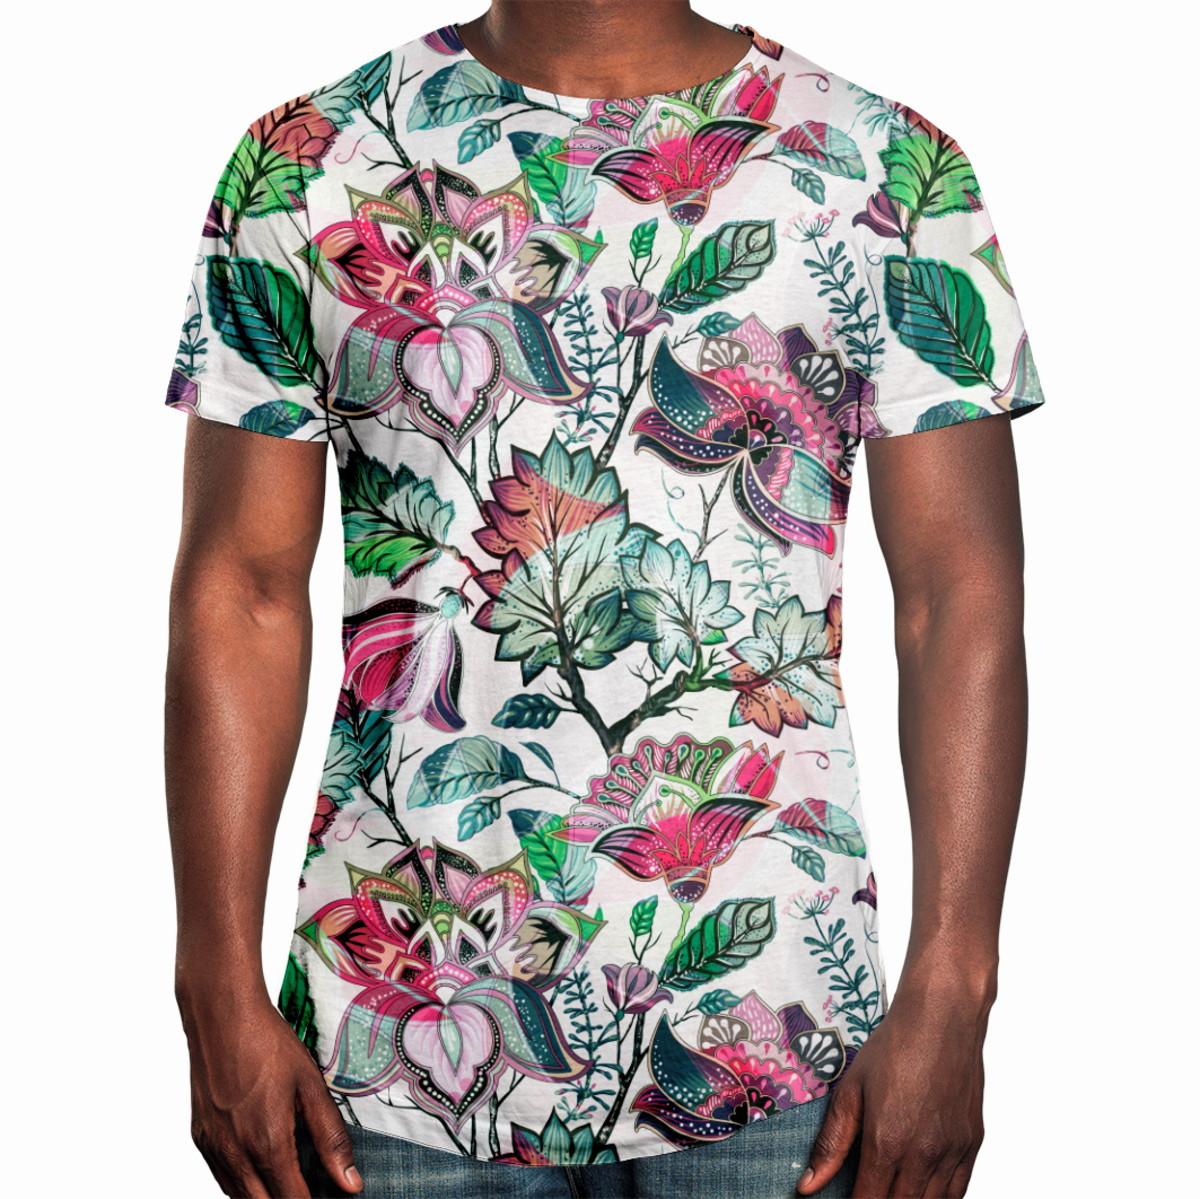 8d83a6487 Camiseta Masculina Longline Swag Floral Jardim Russo no Elo7